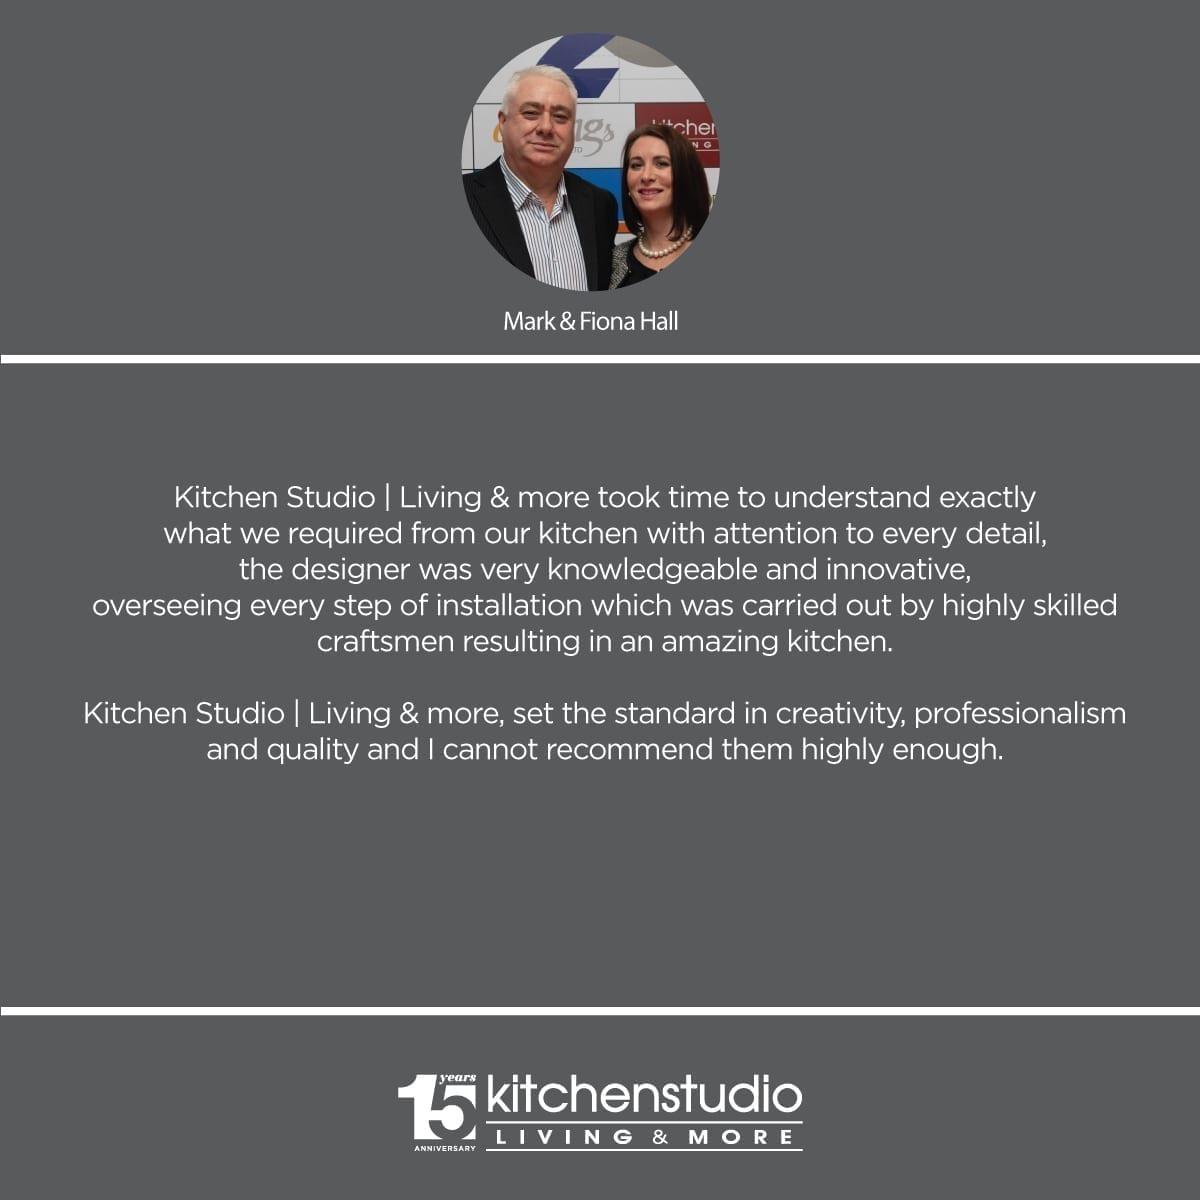 Kitchen Studio Living & more testimonial